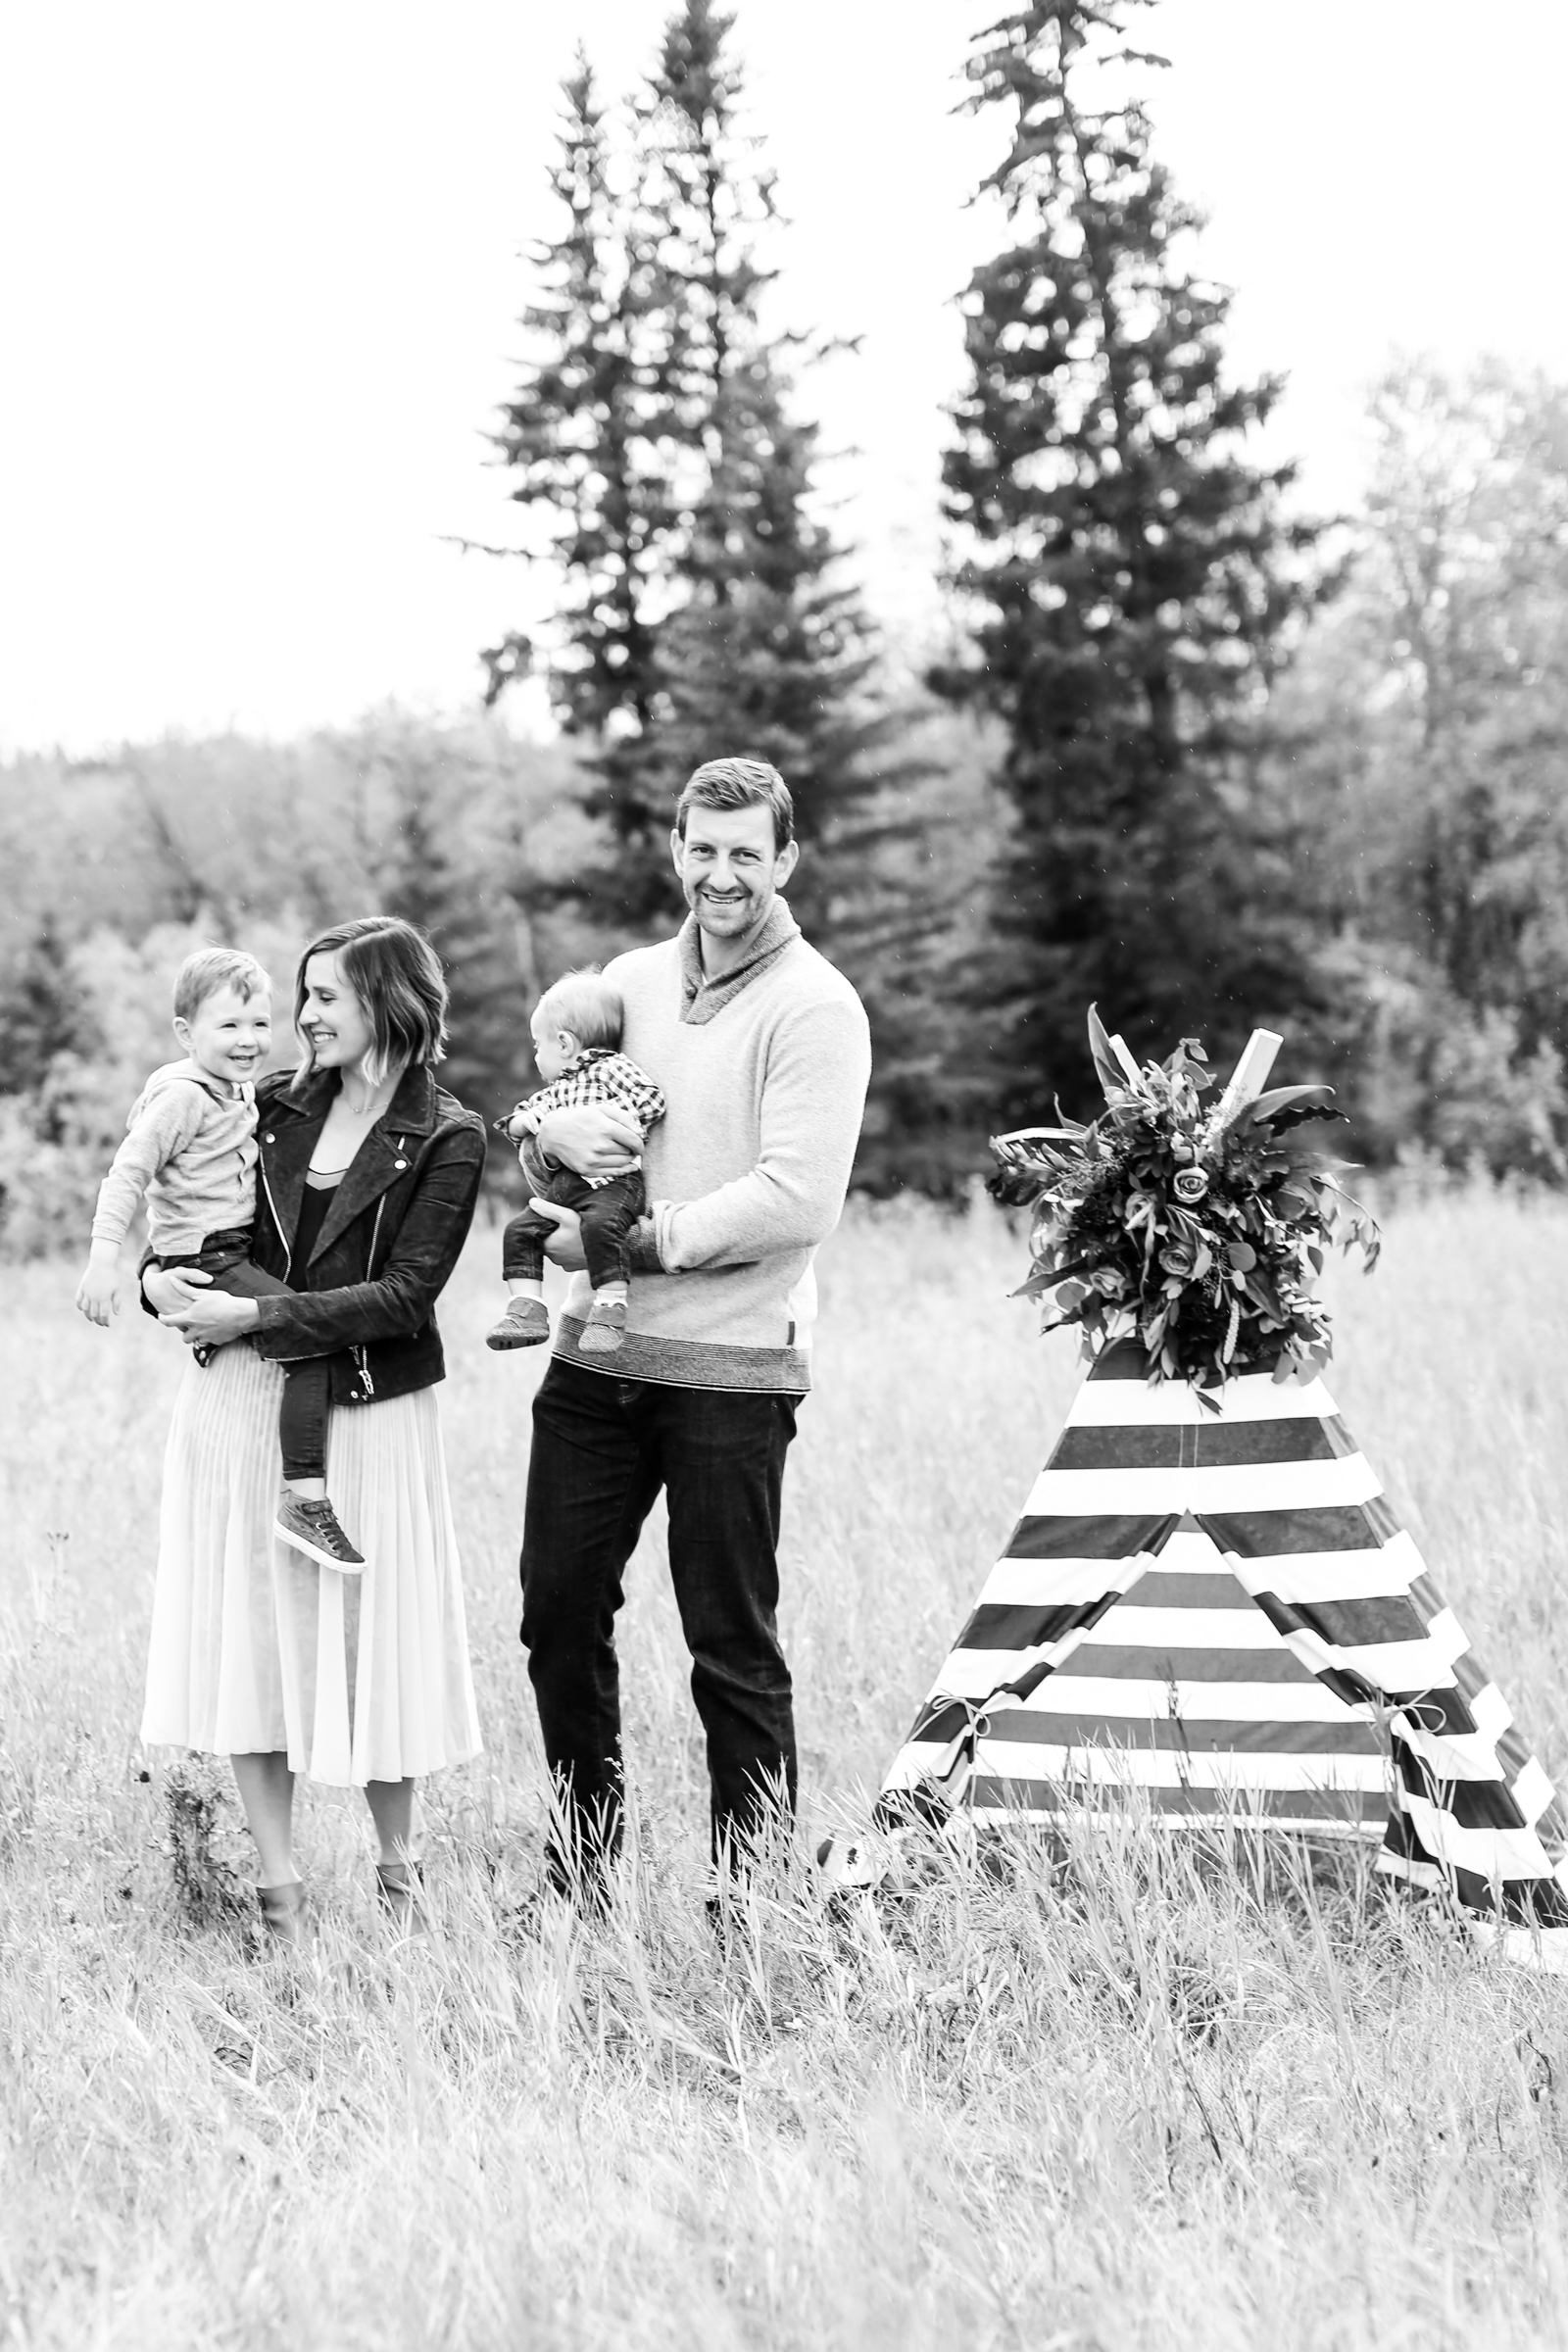 Fall-Family-Creative-Lindsay_Skeans_Photography-10.jpg